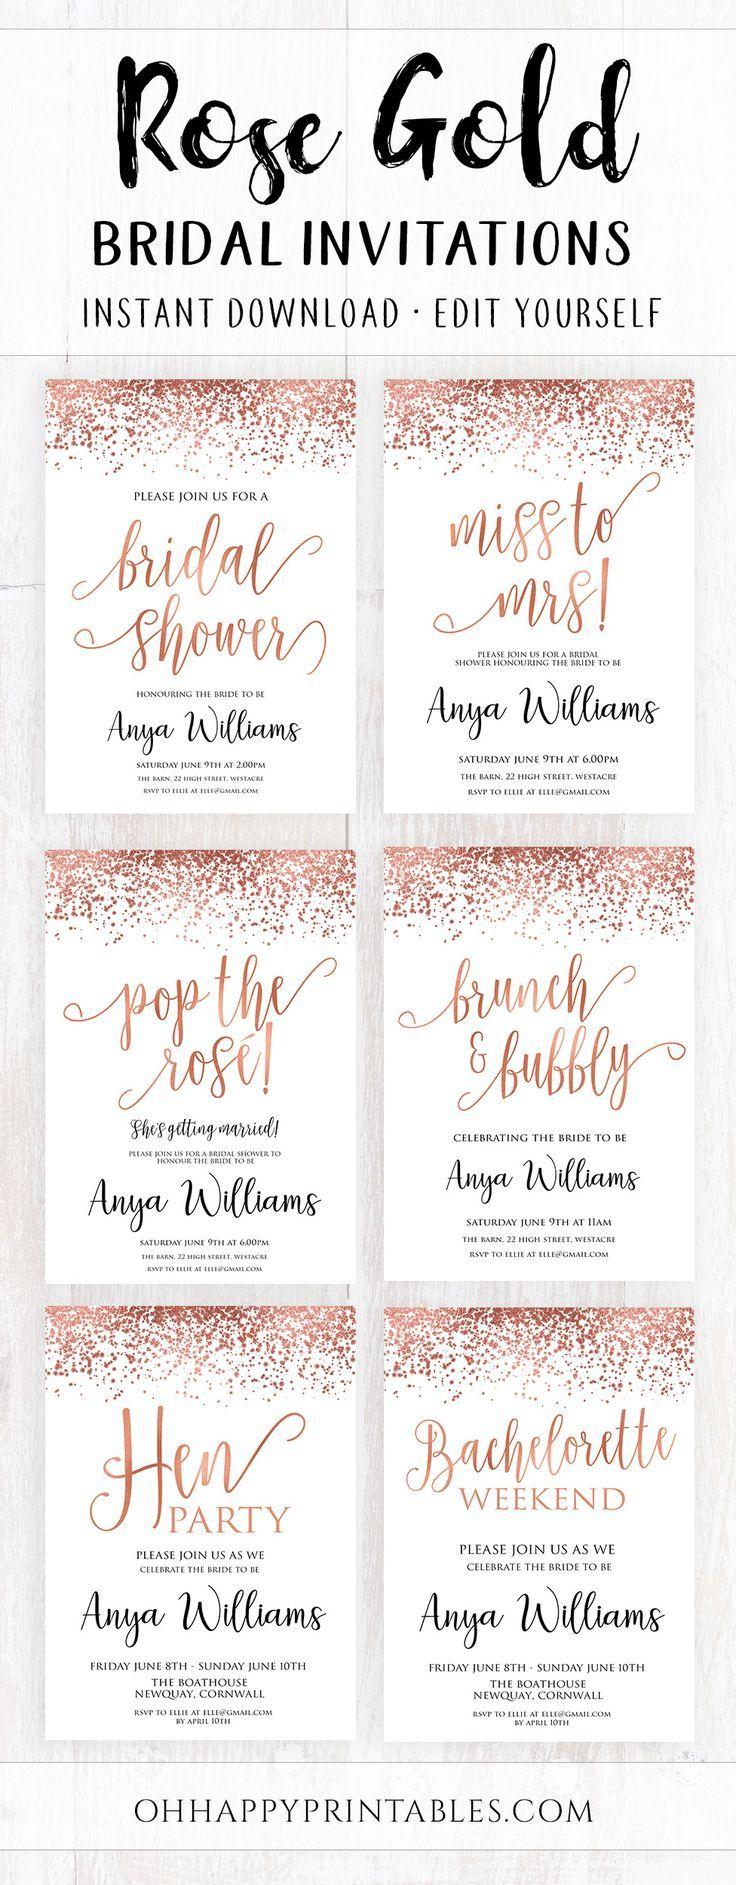 SHOP Rose Gold Bridal Shower Invitation Templates in 2020